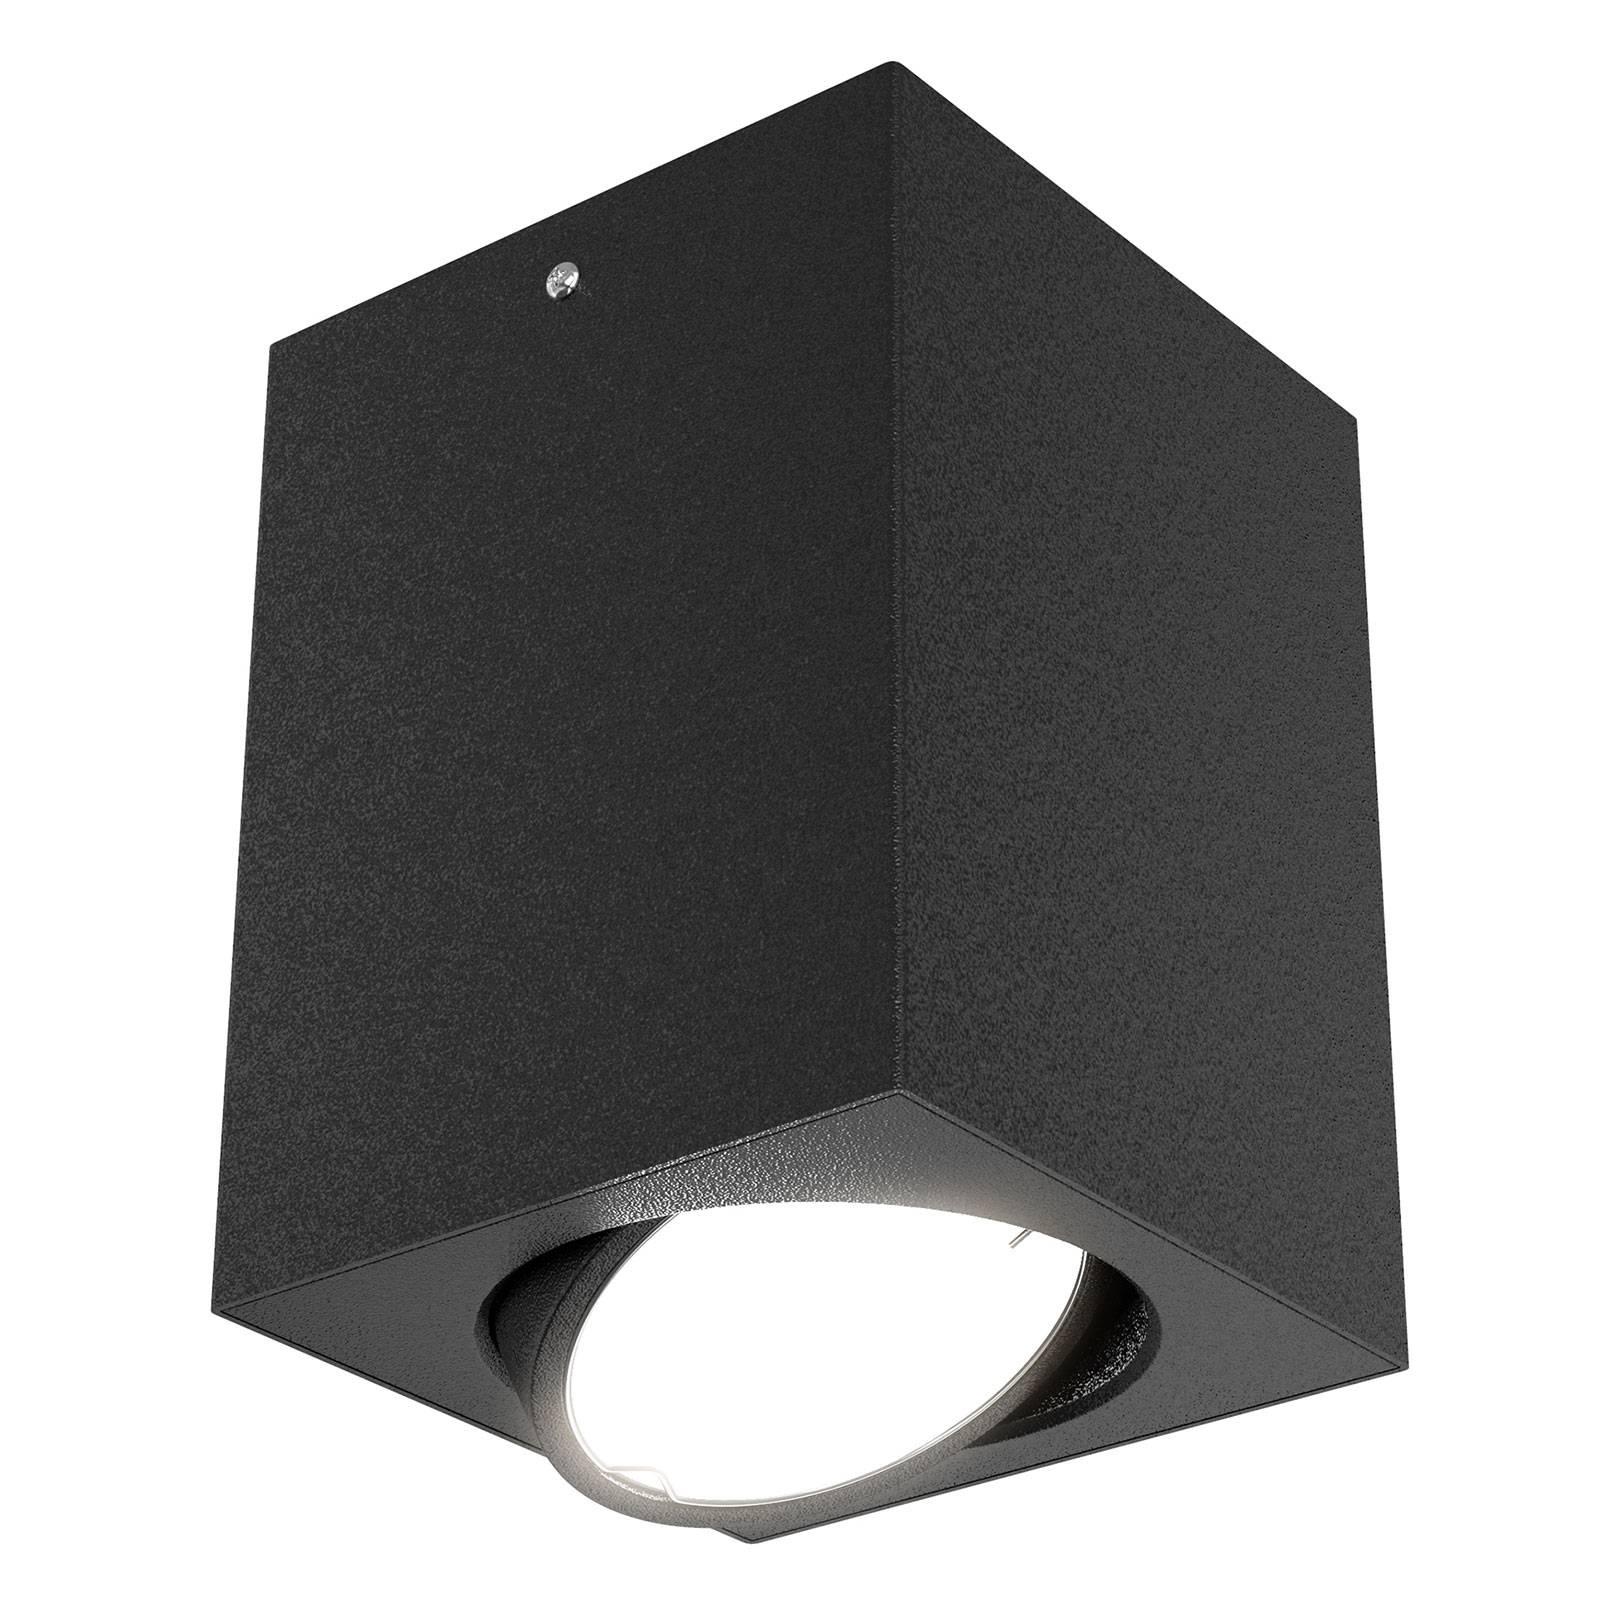 LED-kattospotti 7120, GU10-LED-lamppu, musta